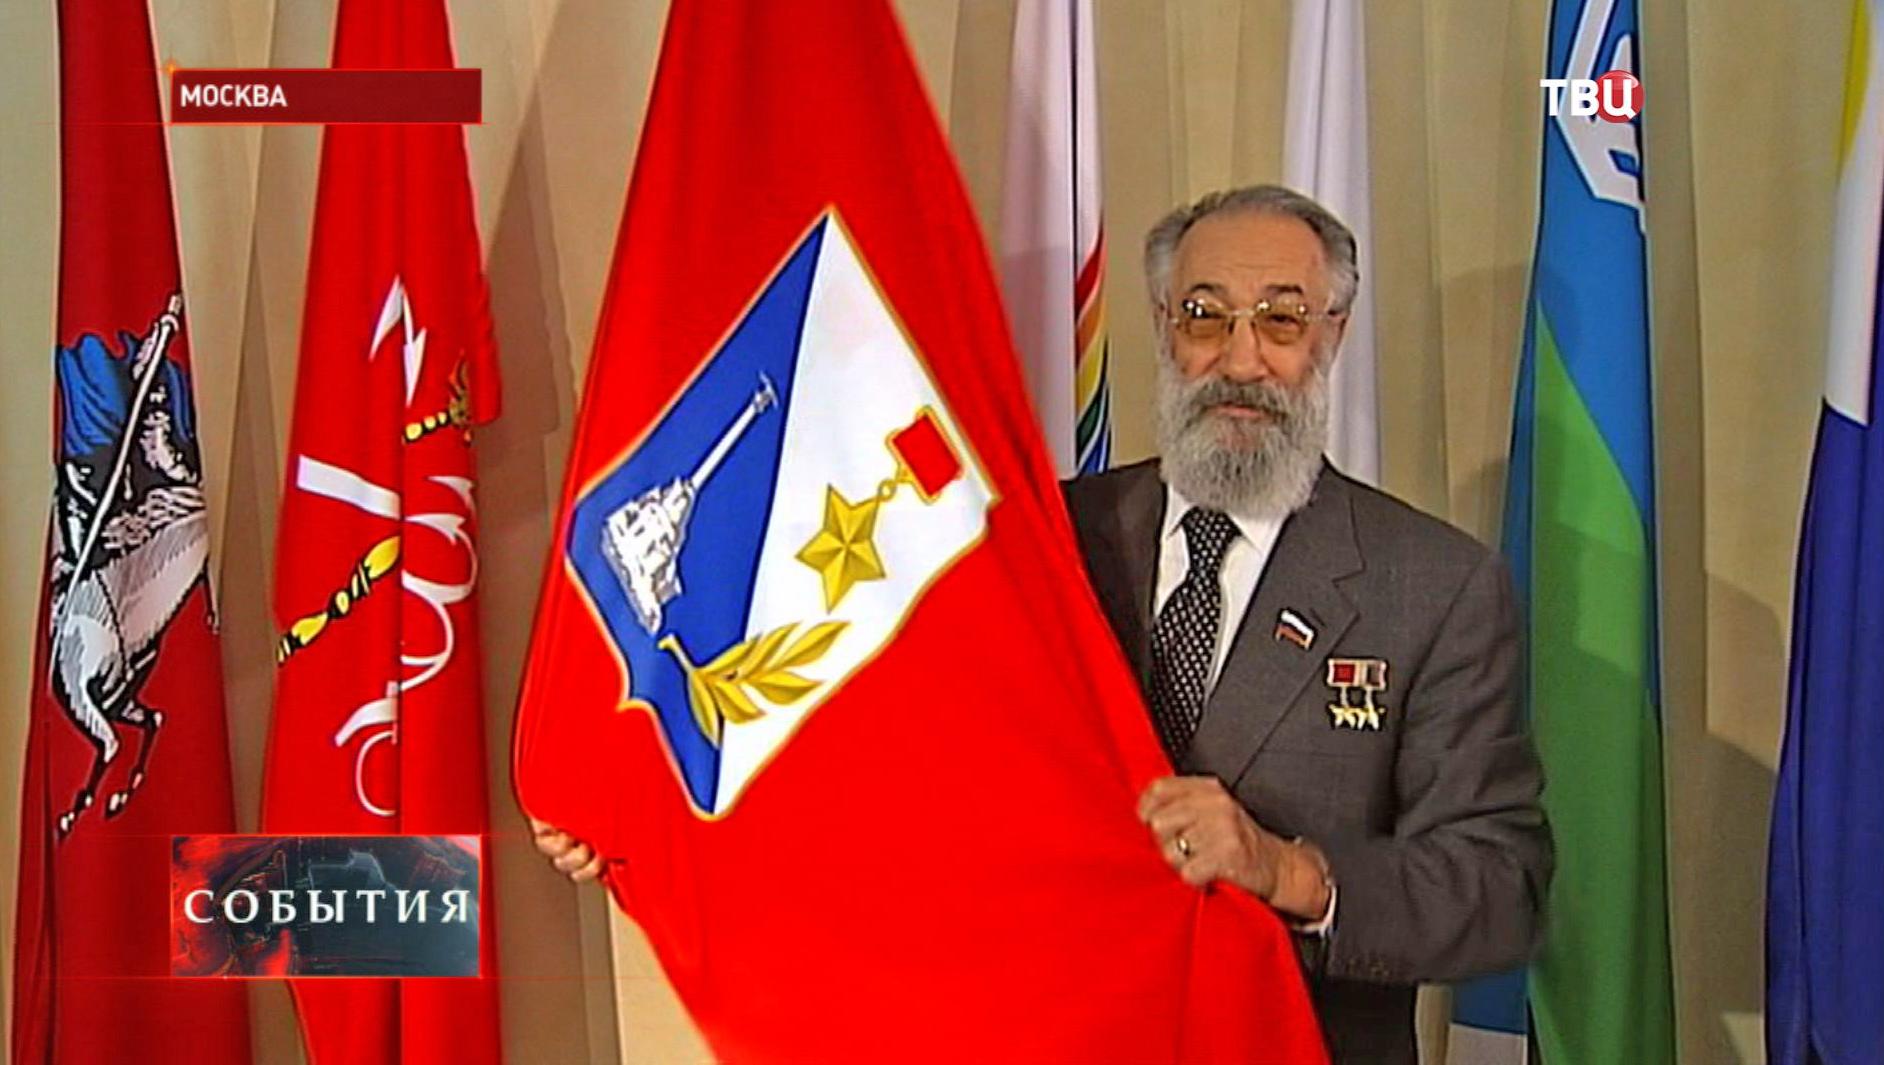 Флаг Севастополя в галерее флагов Совета Федерации